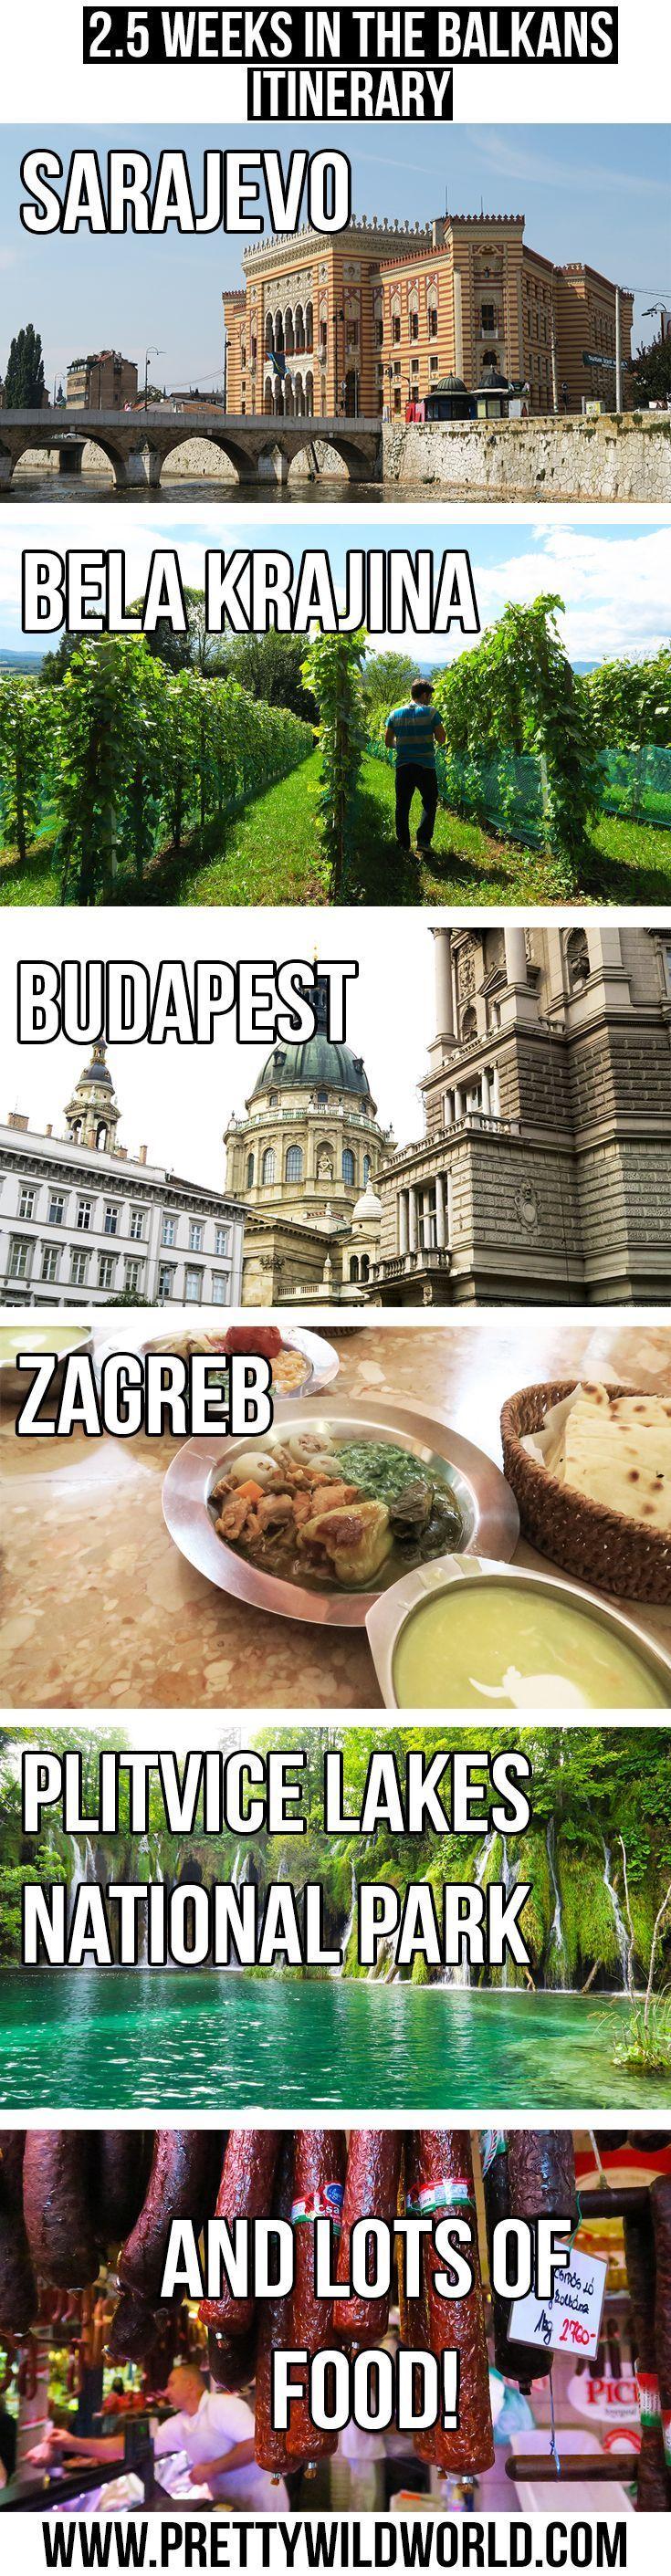 2 5 Weeks Europe Itinerary Travel Around The Balkans By Bus Eastern Europe Travel Europe Itineraries Europe Travel Guide